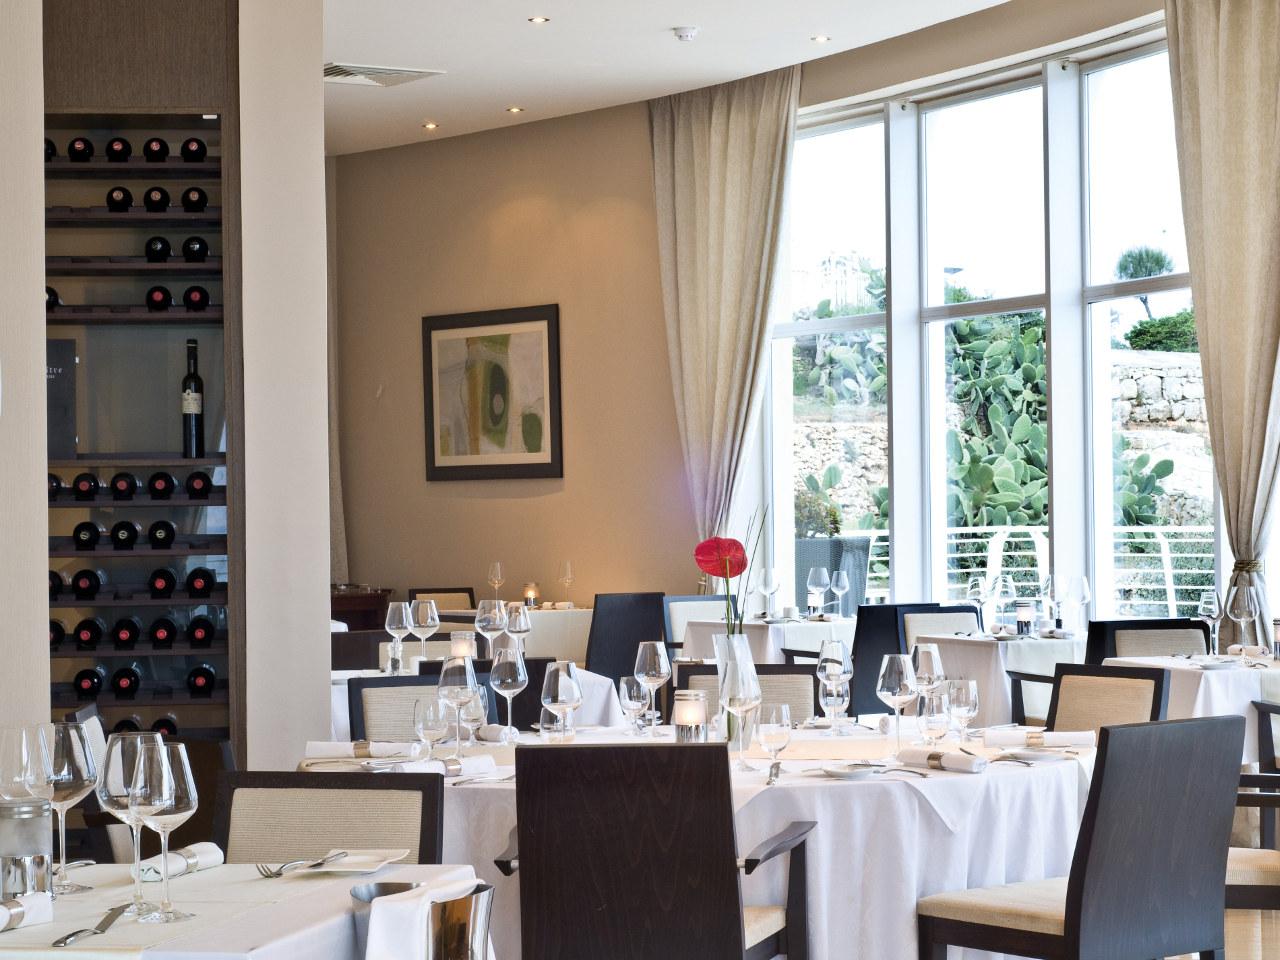 MLAZR-MainGallery-restaurants-bars-3.jpg